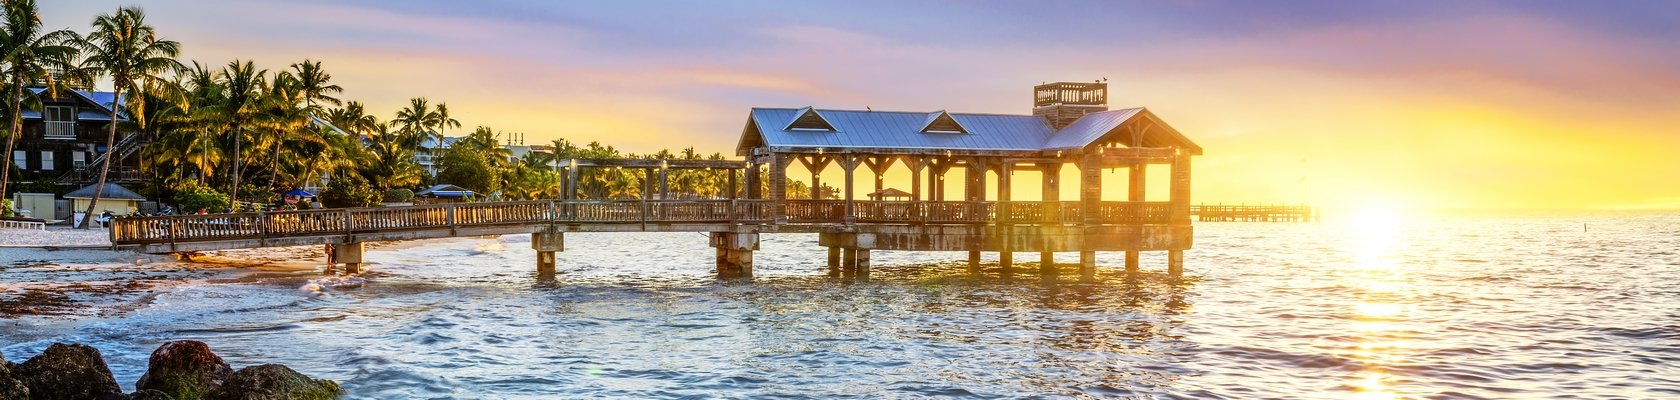 Tropisch paradijs Key West